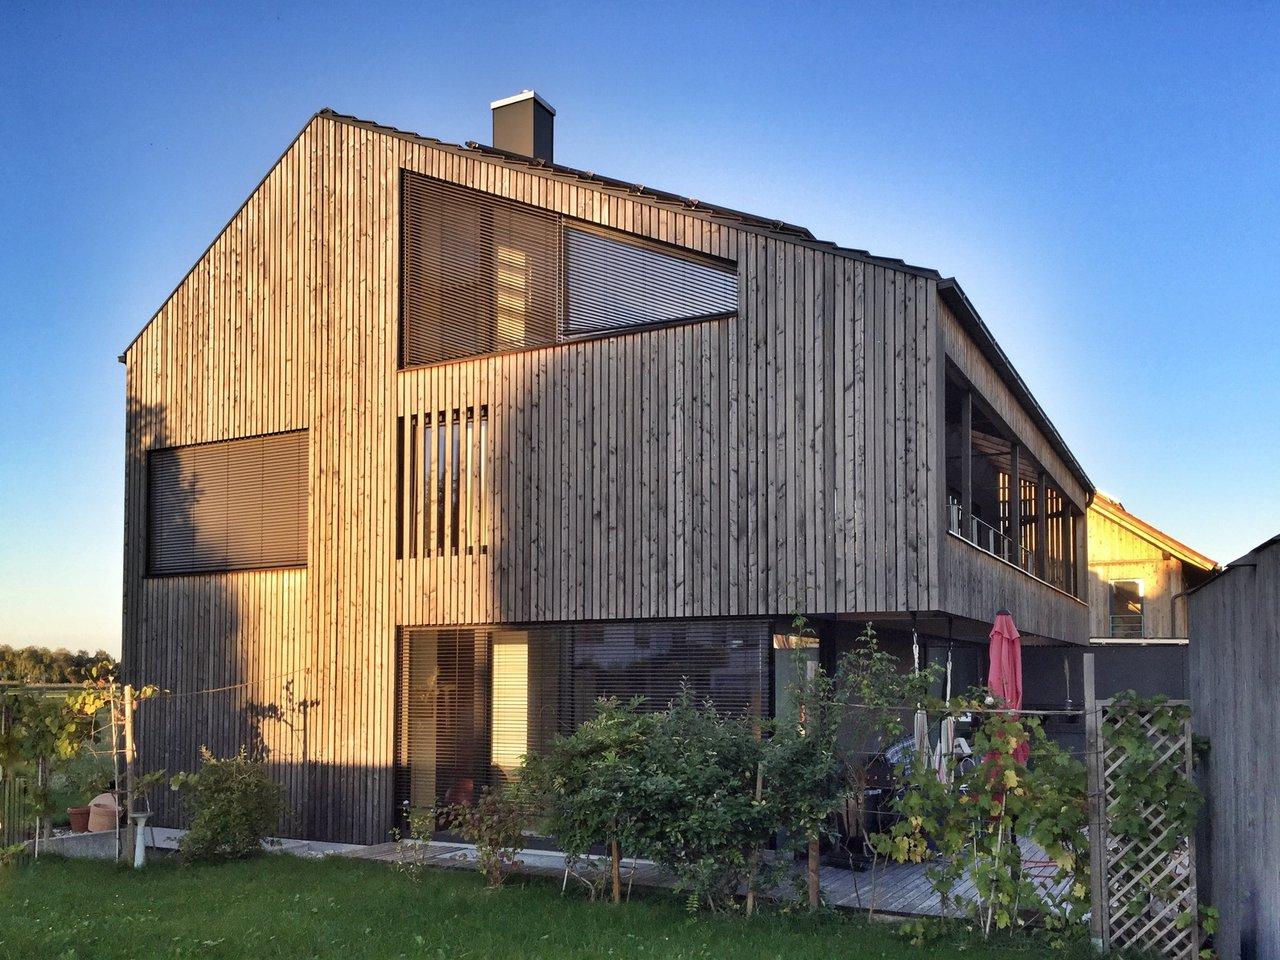 Häufig Holzfassaden - schöne Optik, gute Wärmedämmung - Utz Design GmbH CU42